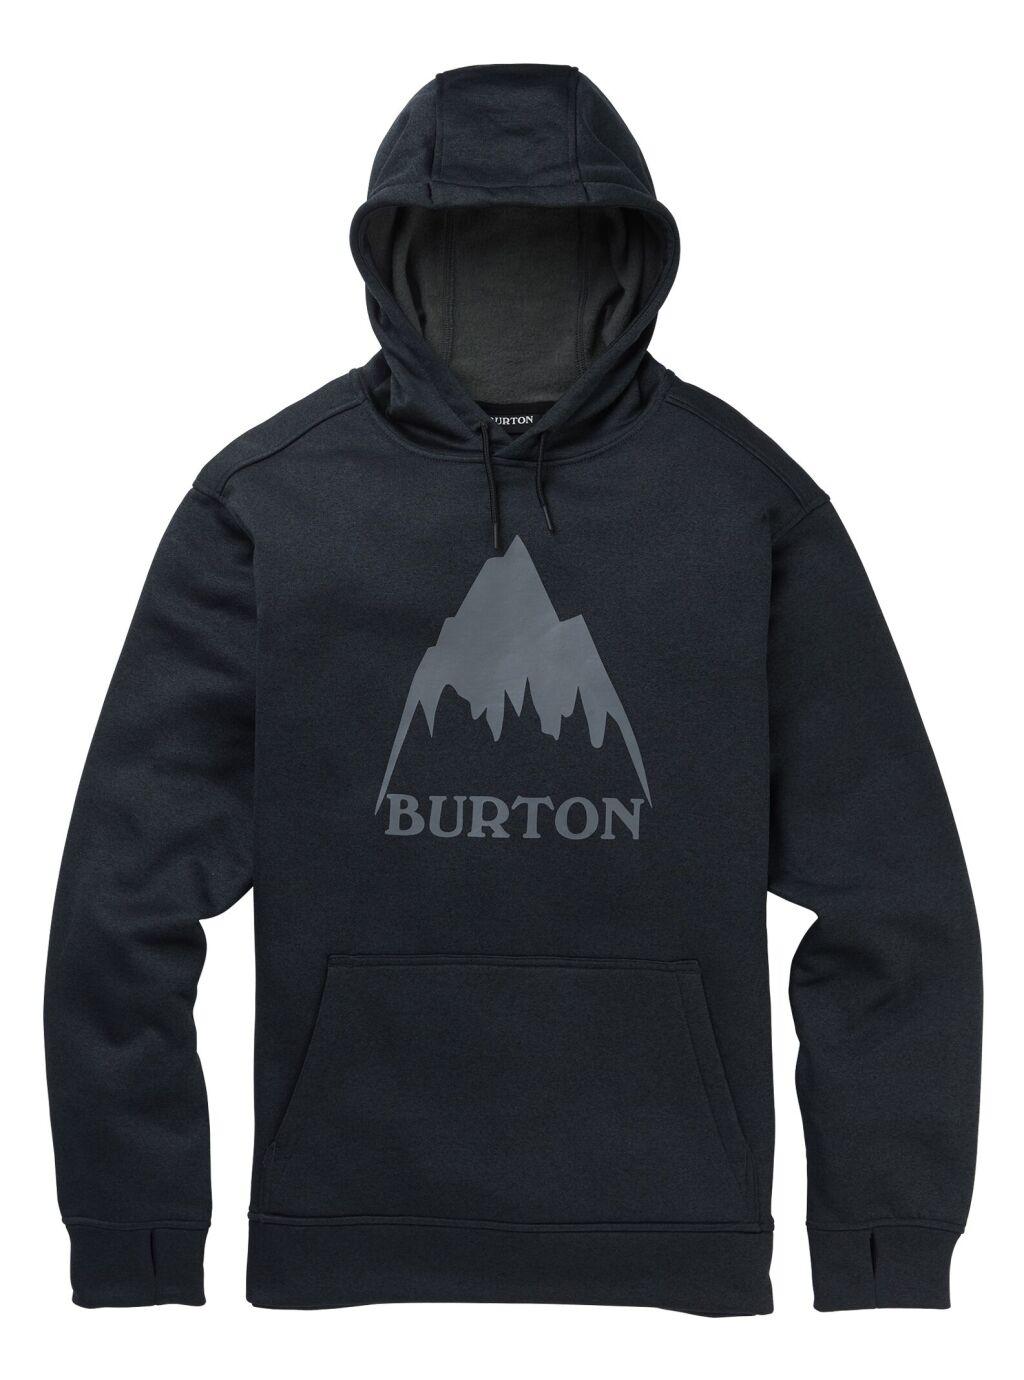 laatu ostokset uusia kuvia Burton Oak Pullover Hoodie M - Miesten huppari   Intersport